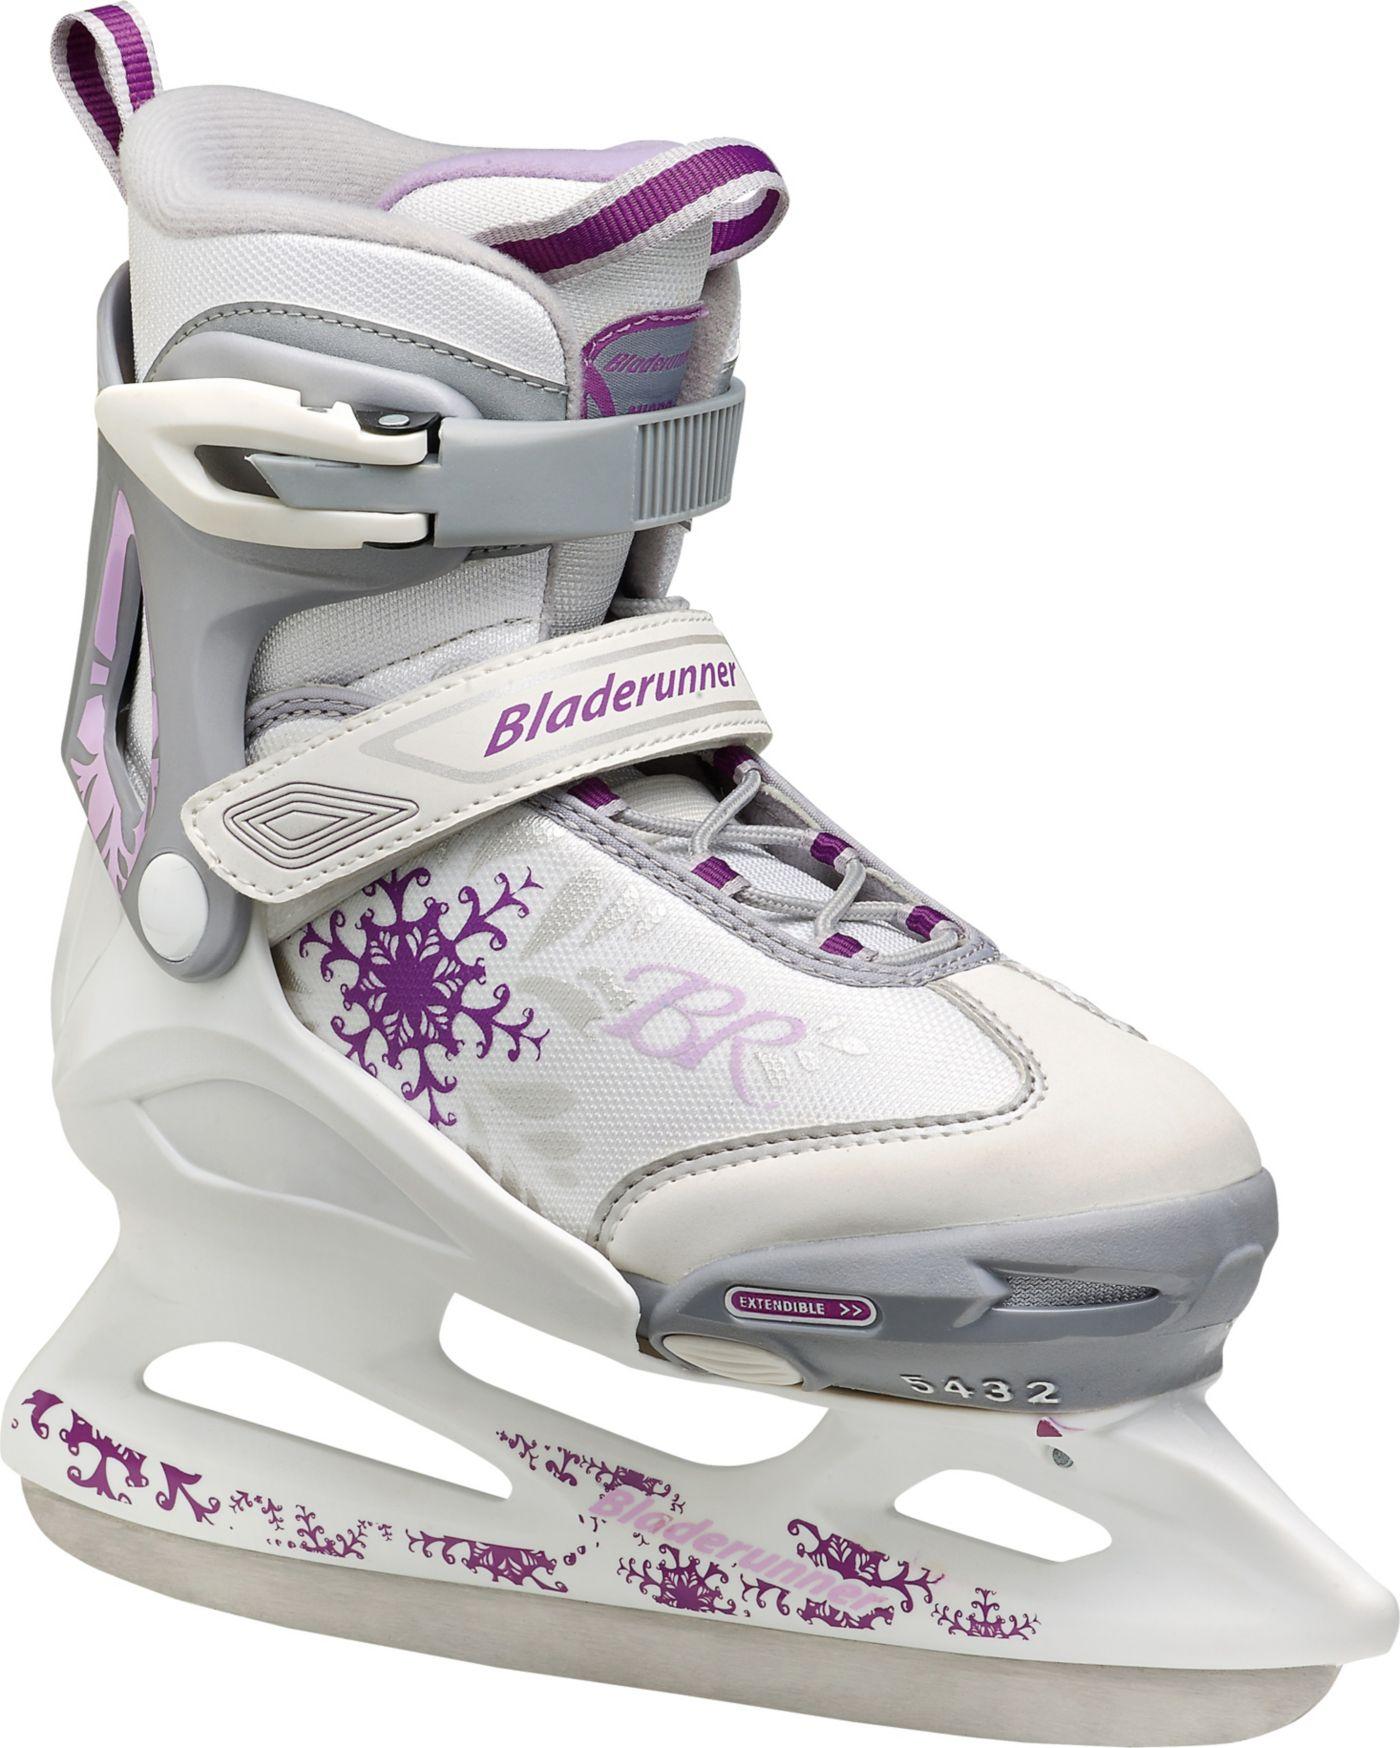 Rollerblade Girls' Bladerunner Micro Ice Skates